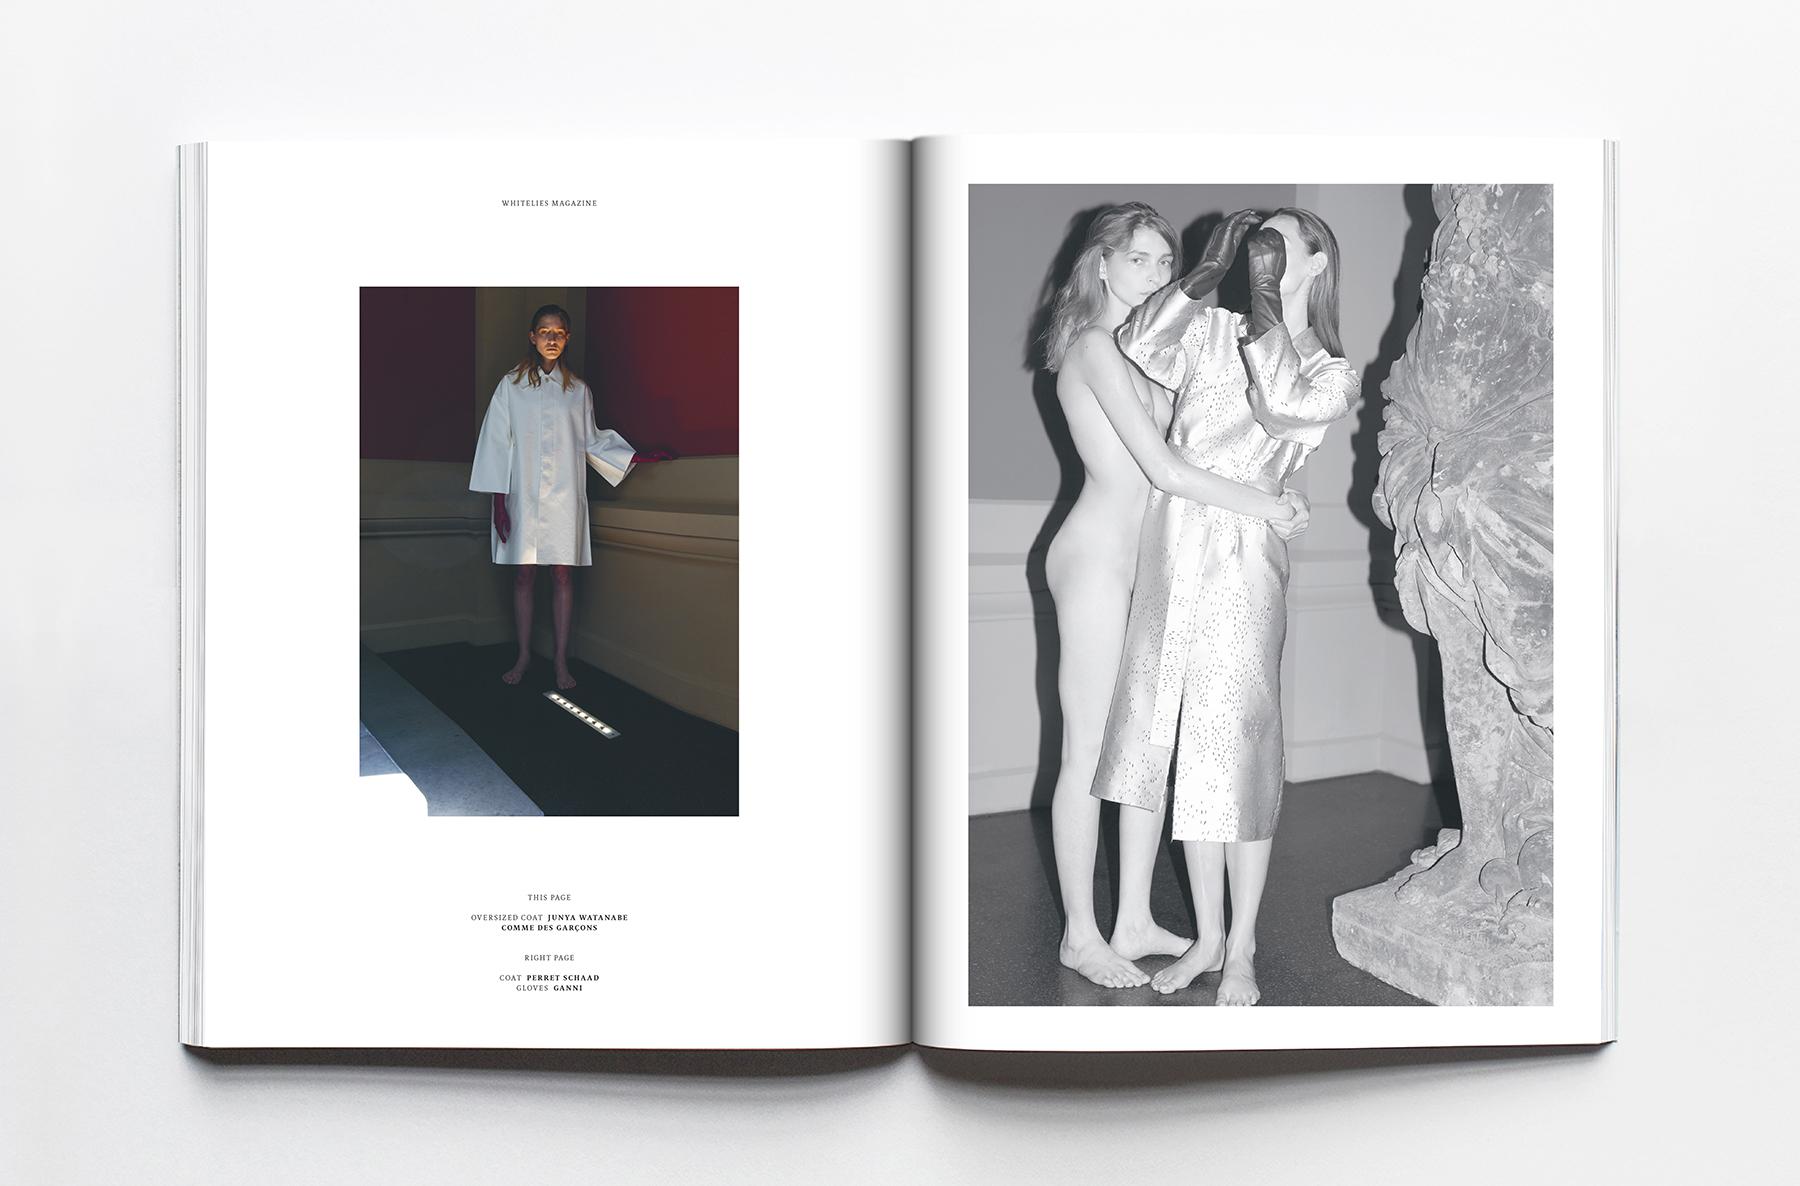 wla_magazine_44.jpg